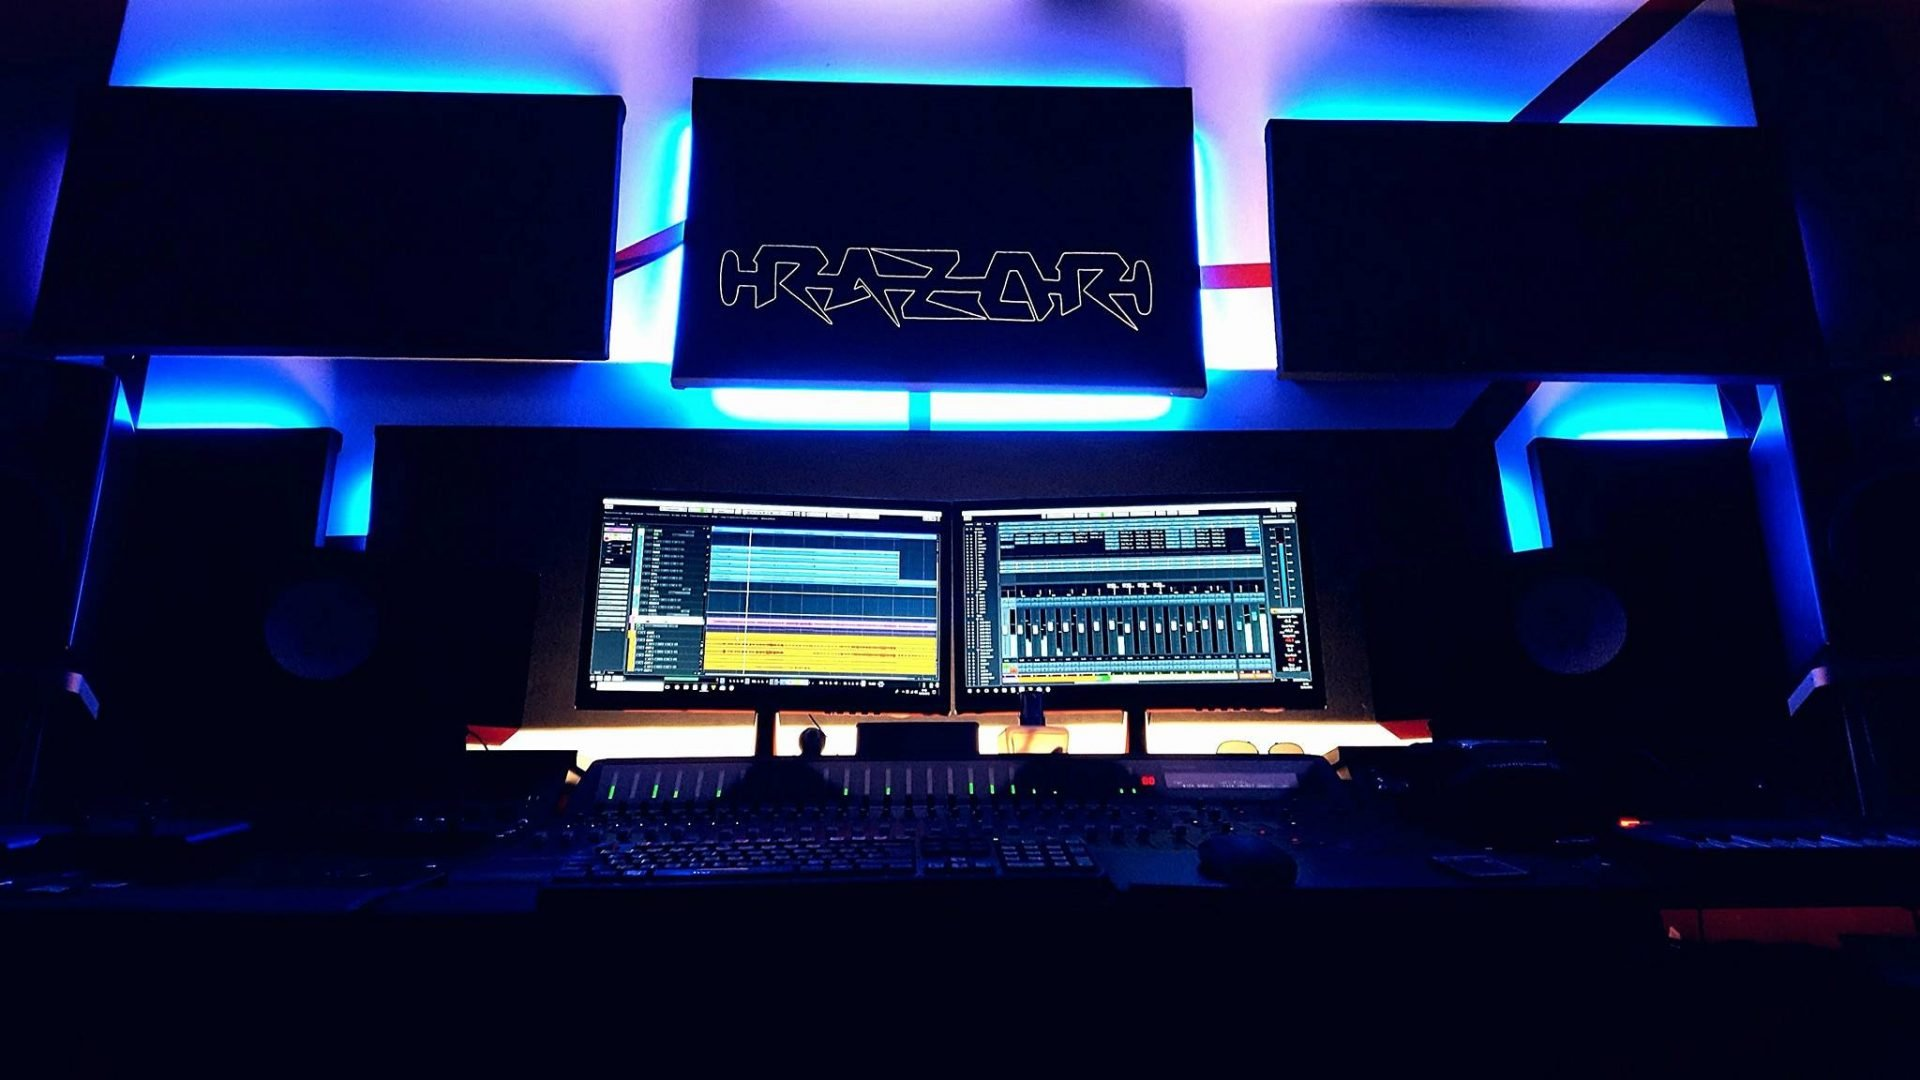 Razor Recording Studio